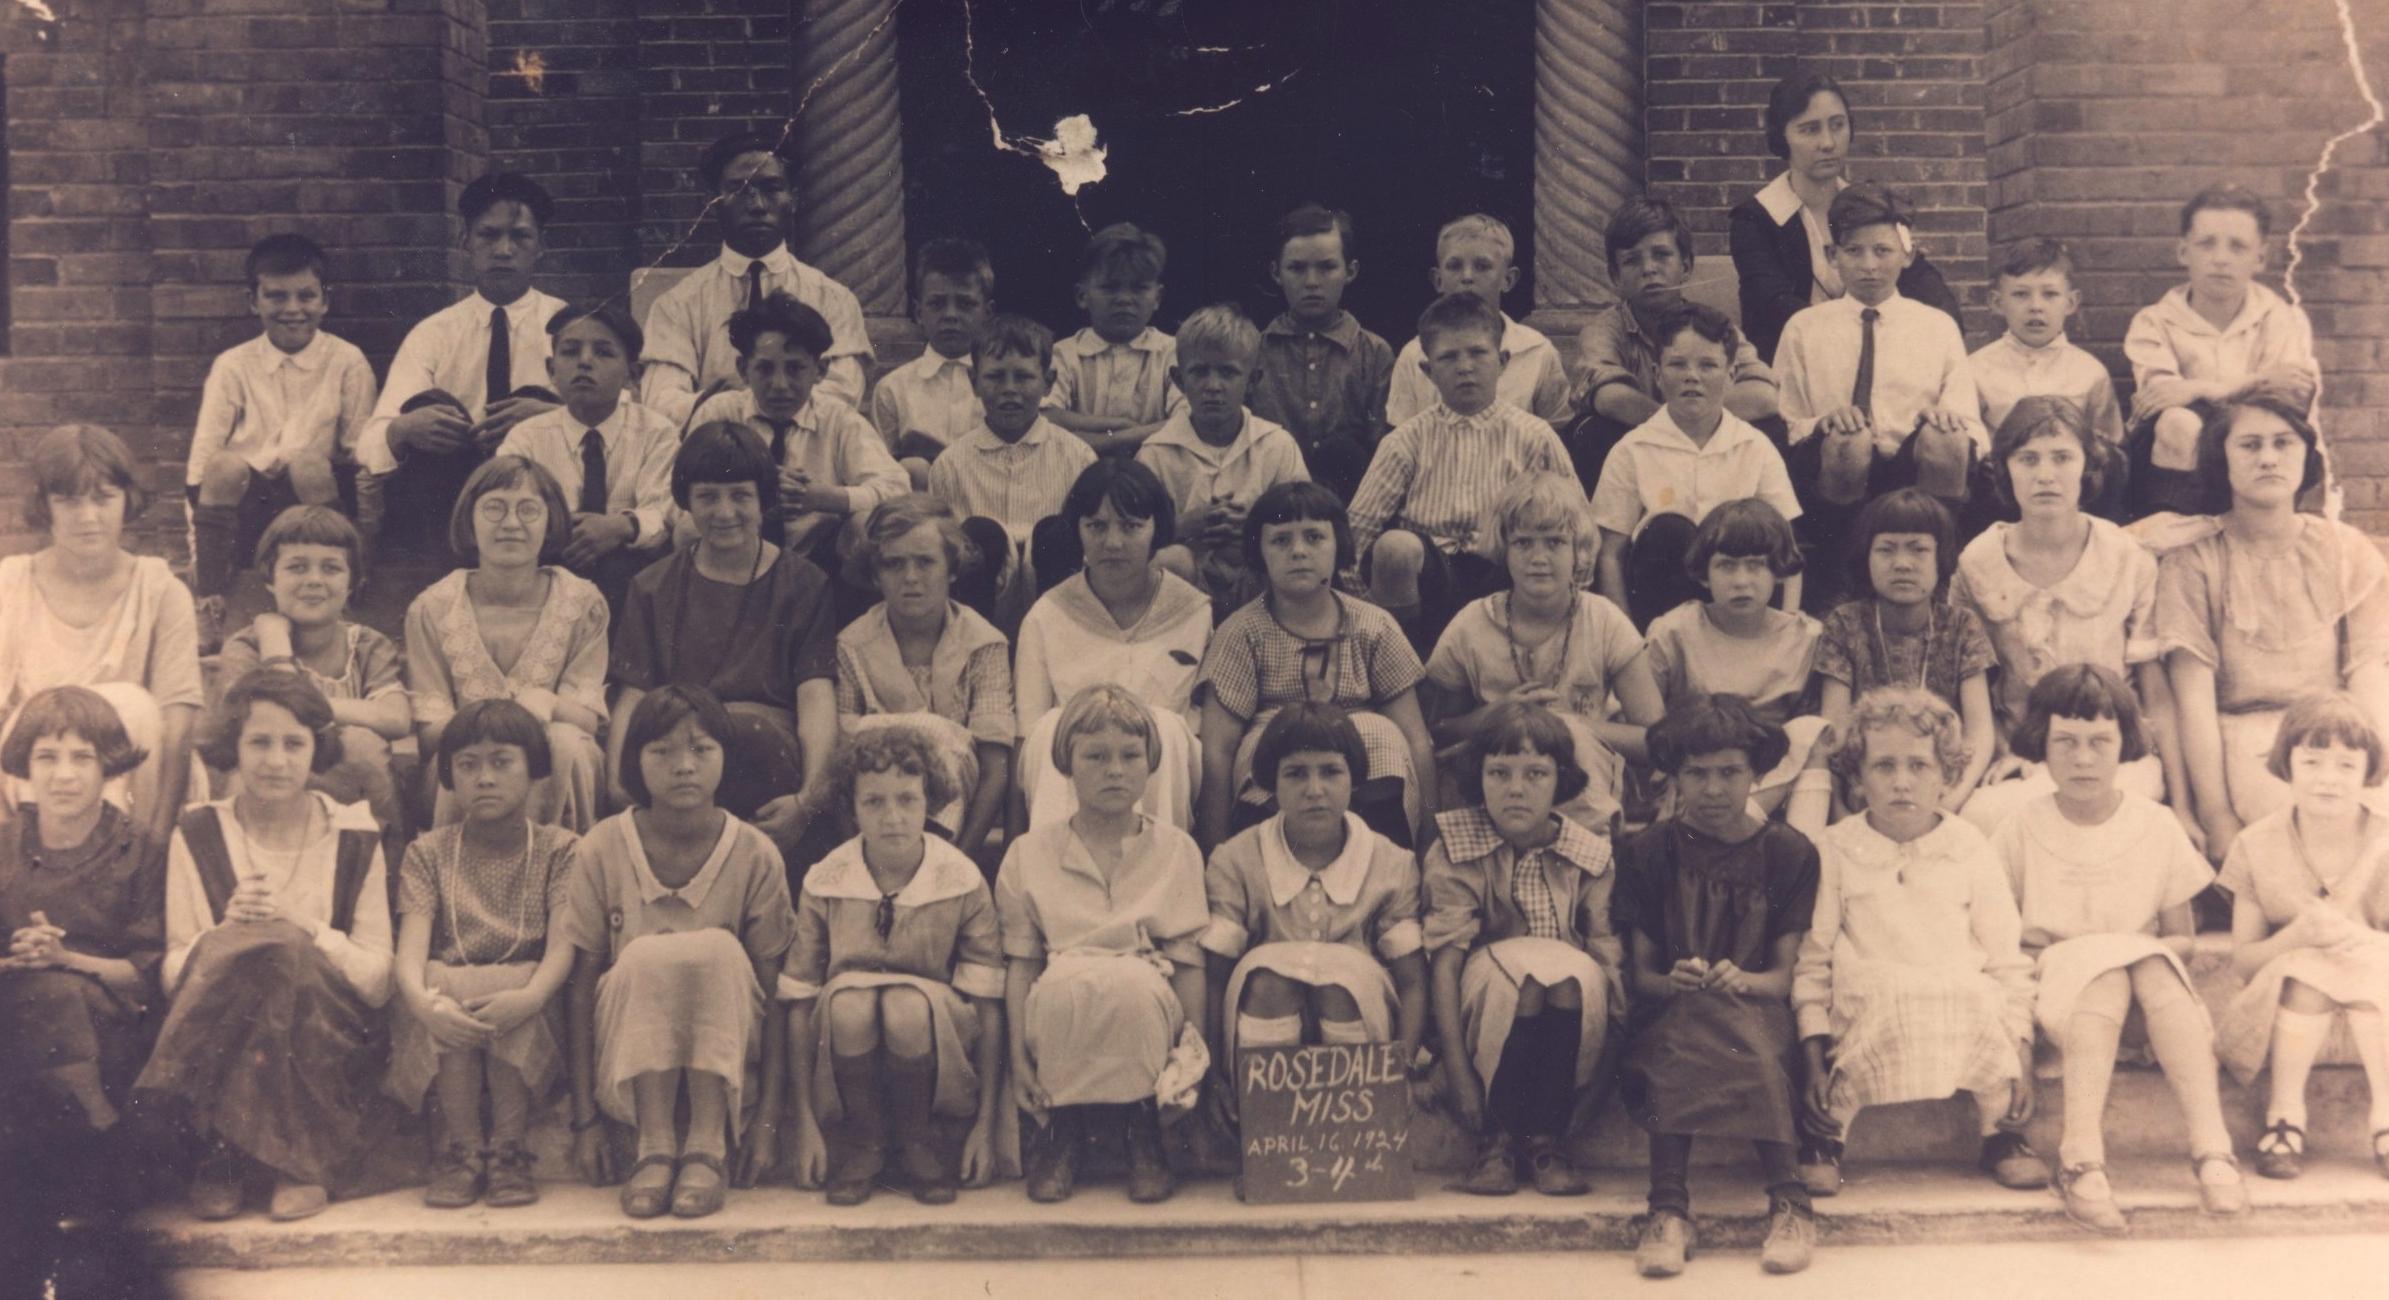 Rosedale 1924  - bobo - custom crop.jpg